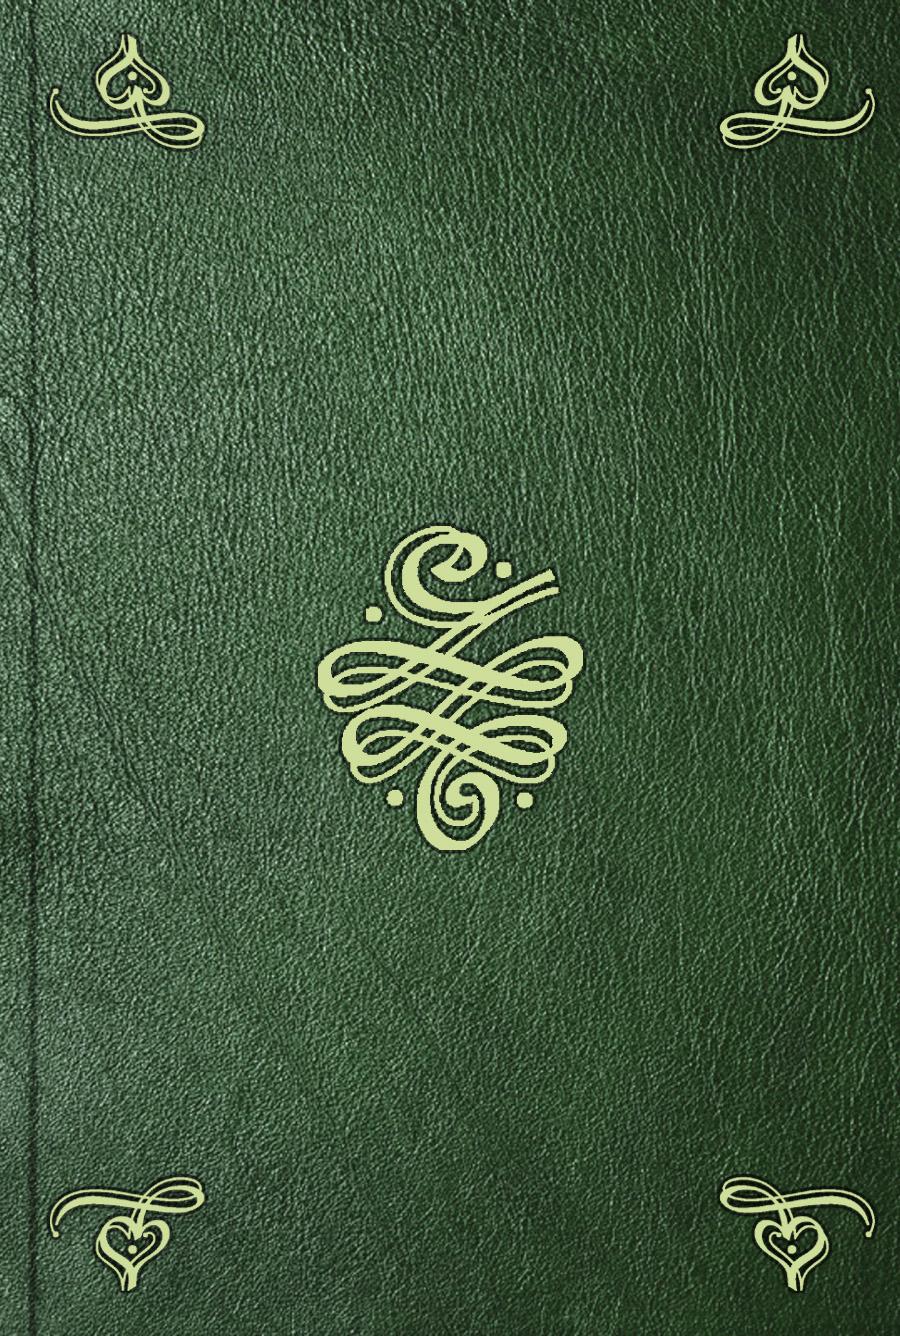 Johann Stoy Manuel elementaire en figures. Vol. 3 ghost vol 3 2013 tpb